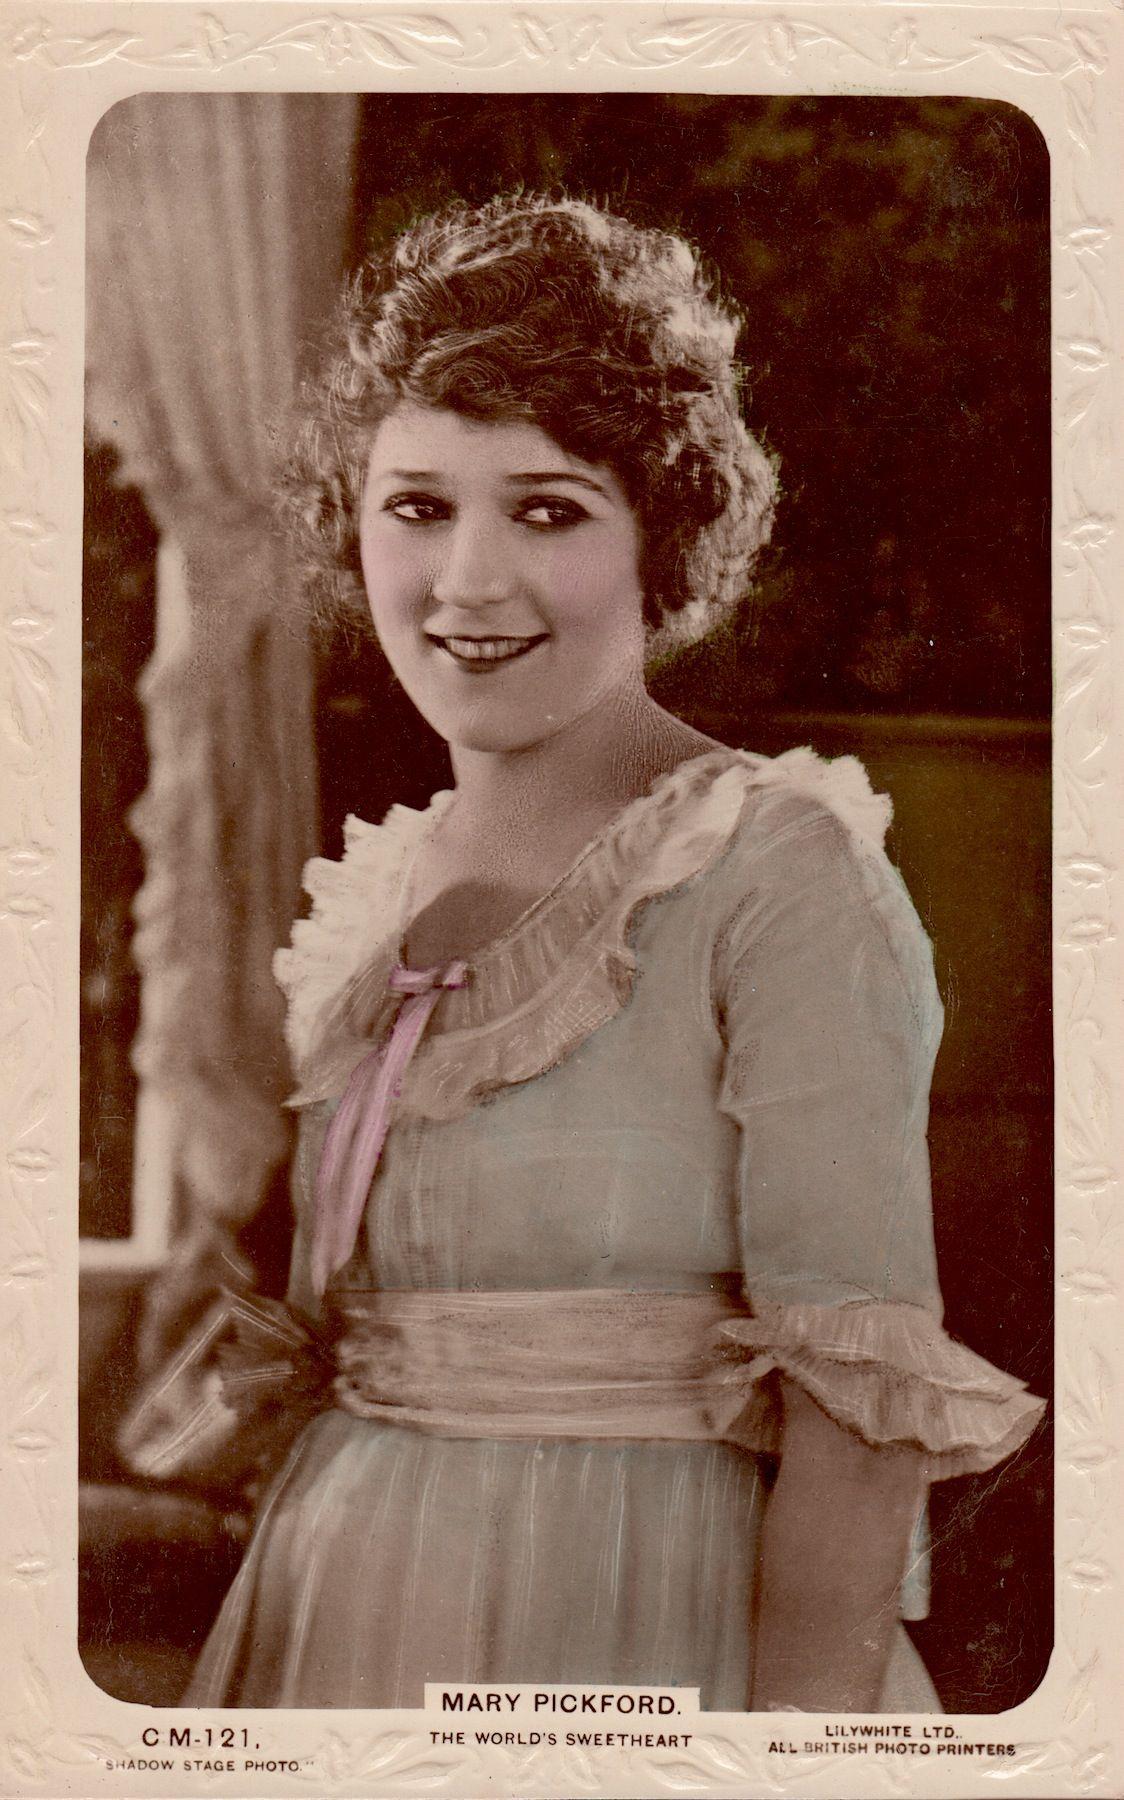 MARY PICKFORD 'The World's Sweetheart' Silent Star Lilywhite postcard (Minkshmink Vintage Postcard Collection on pinterest)